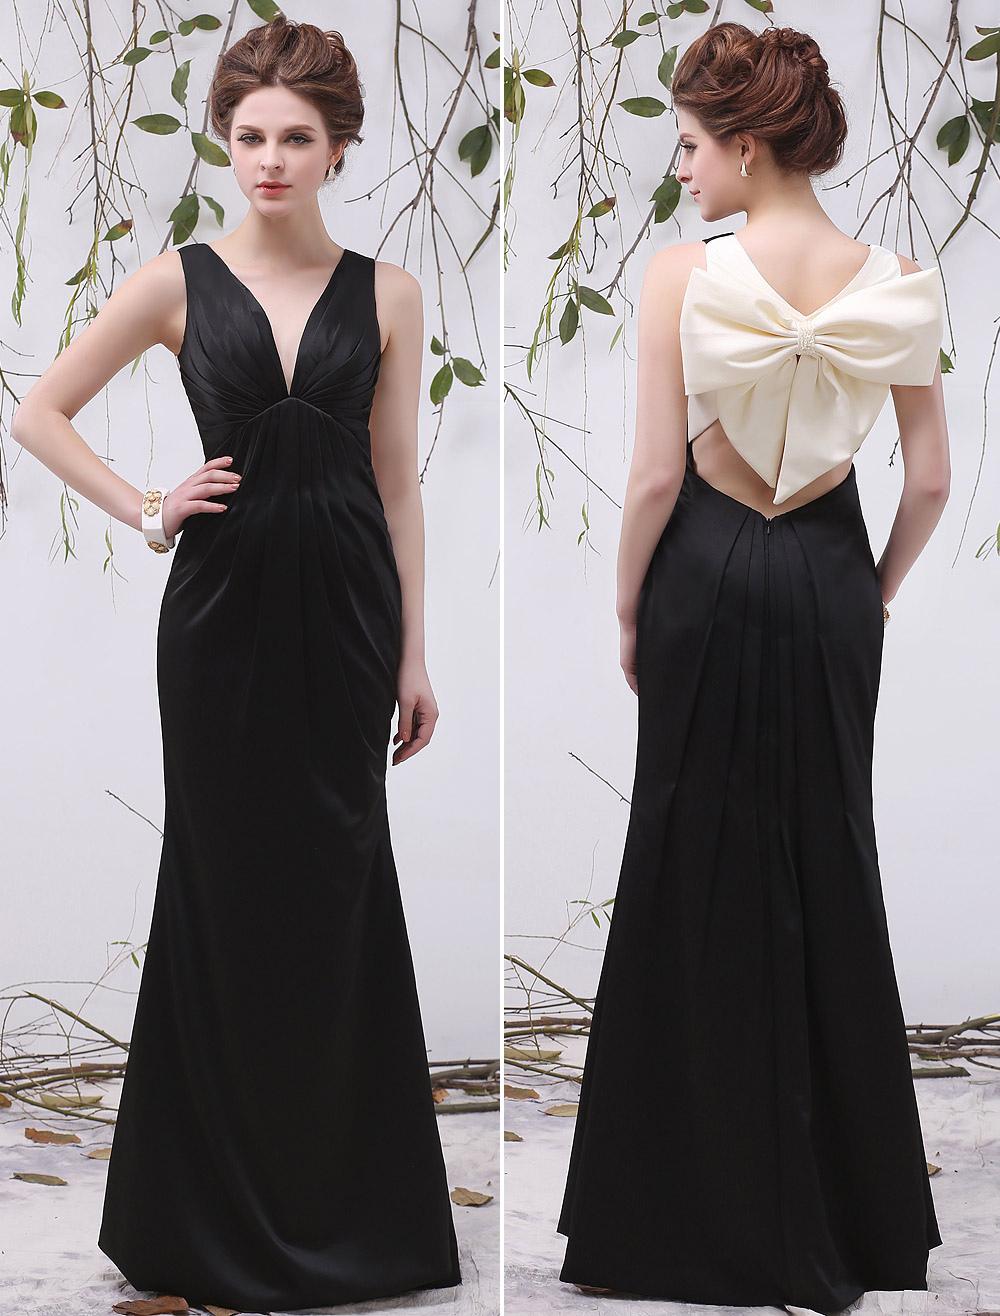 Black Cut Out V-Neck Bow Mermaid Satin Unique Evening Dress For Women  Milanoo